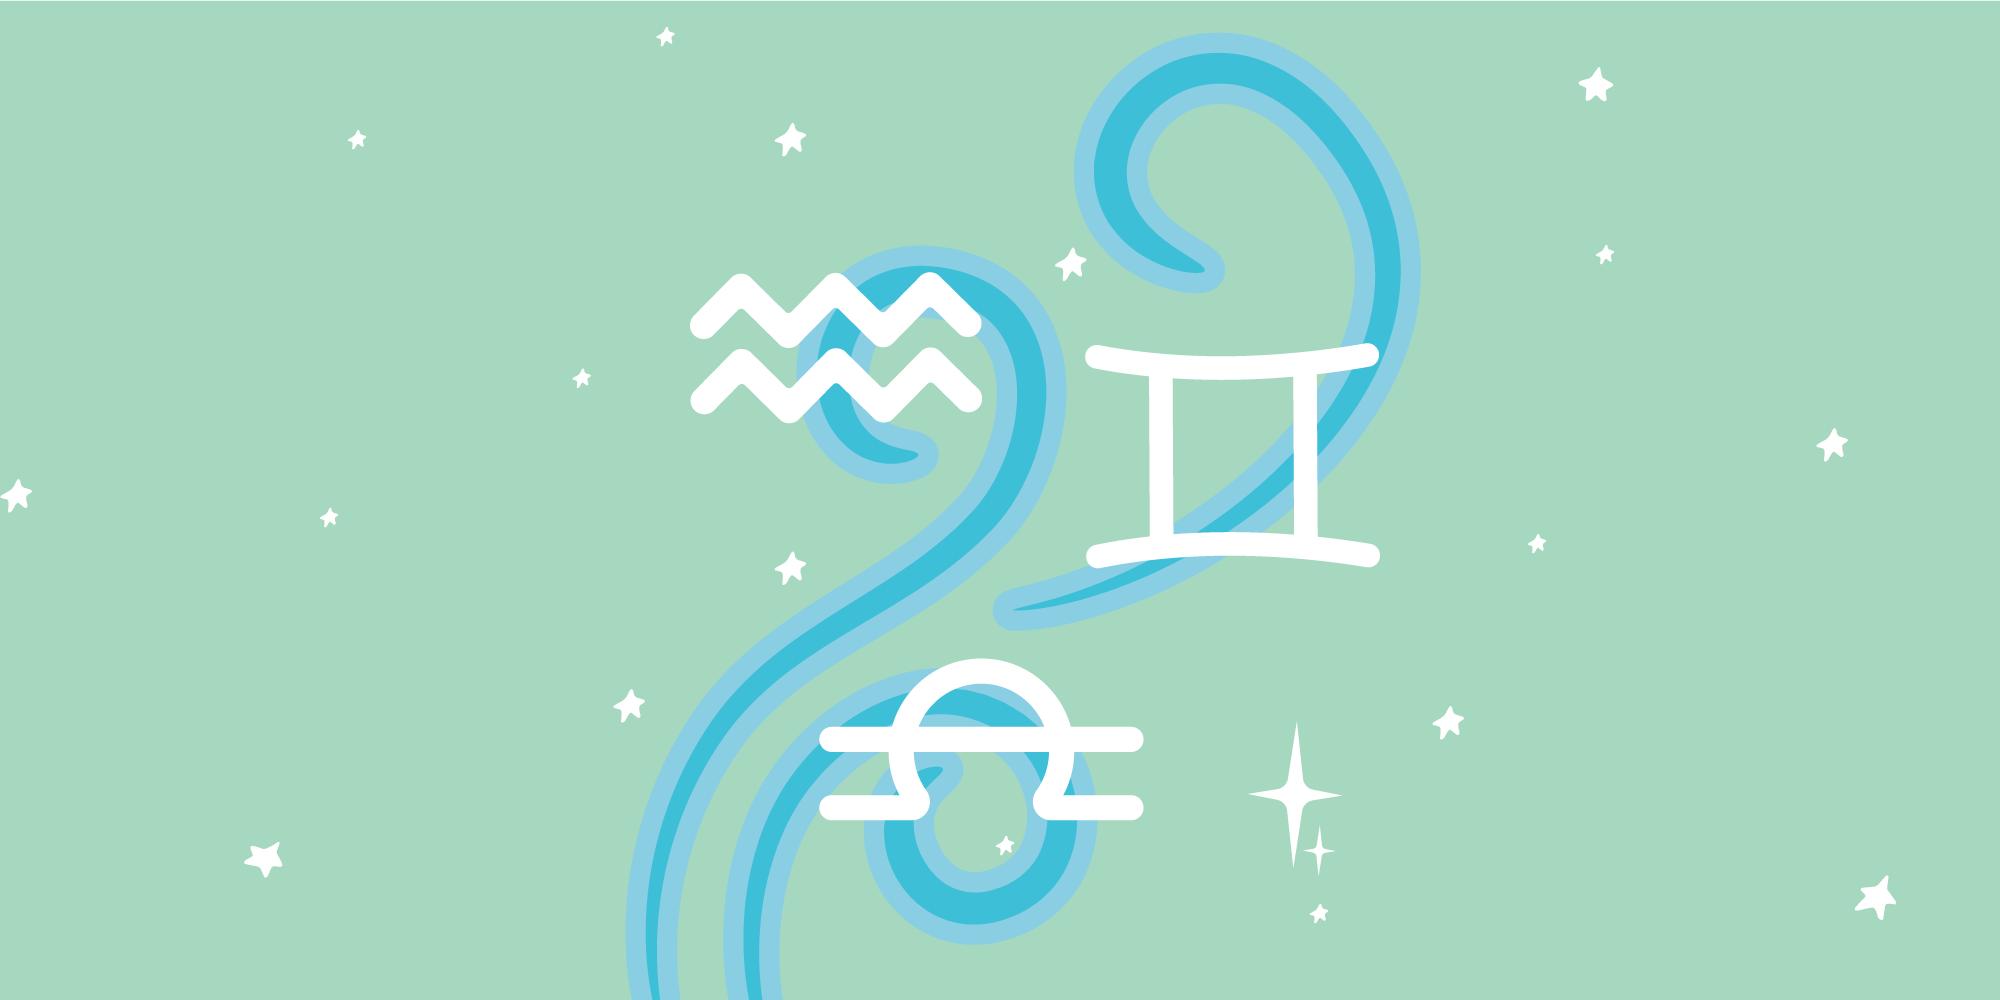 Zodiac S Air Signs Aquarius Gemini Libra Traits Explained